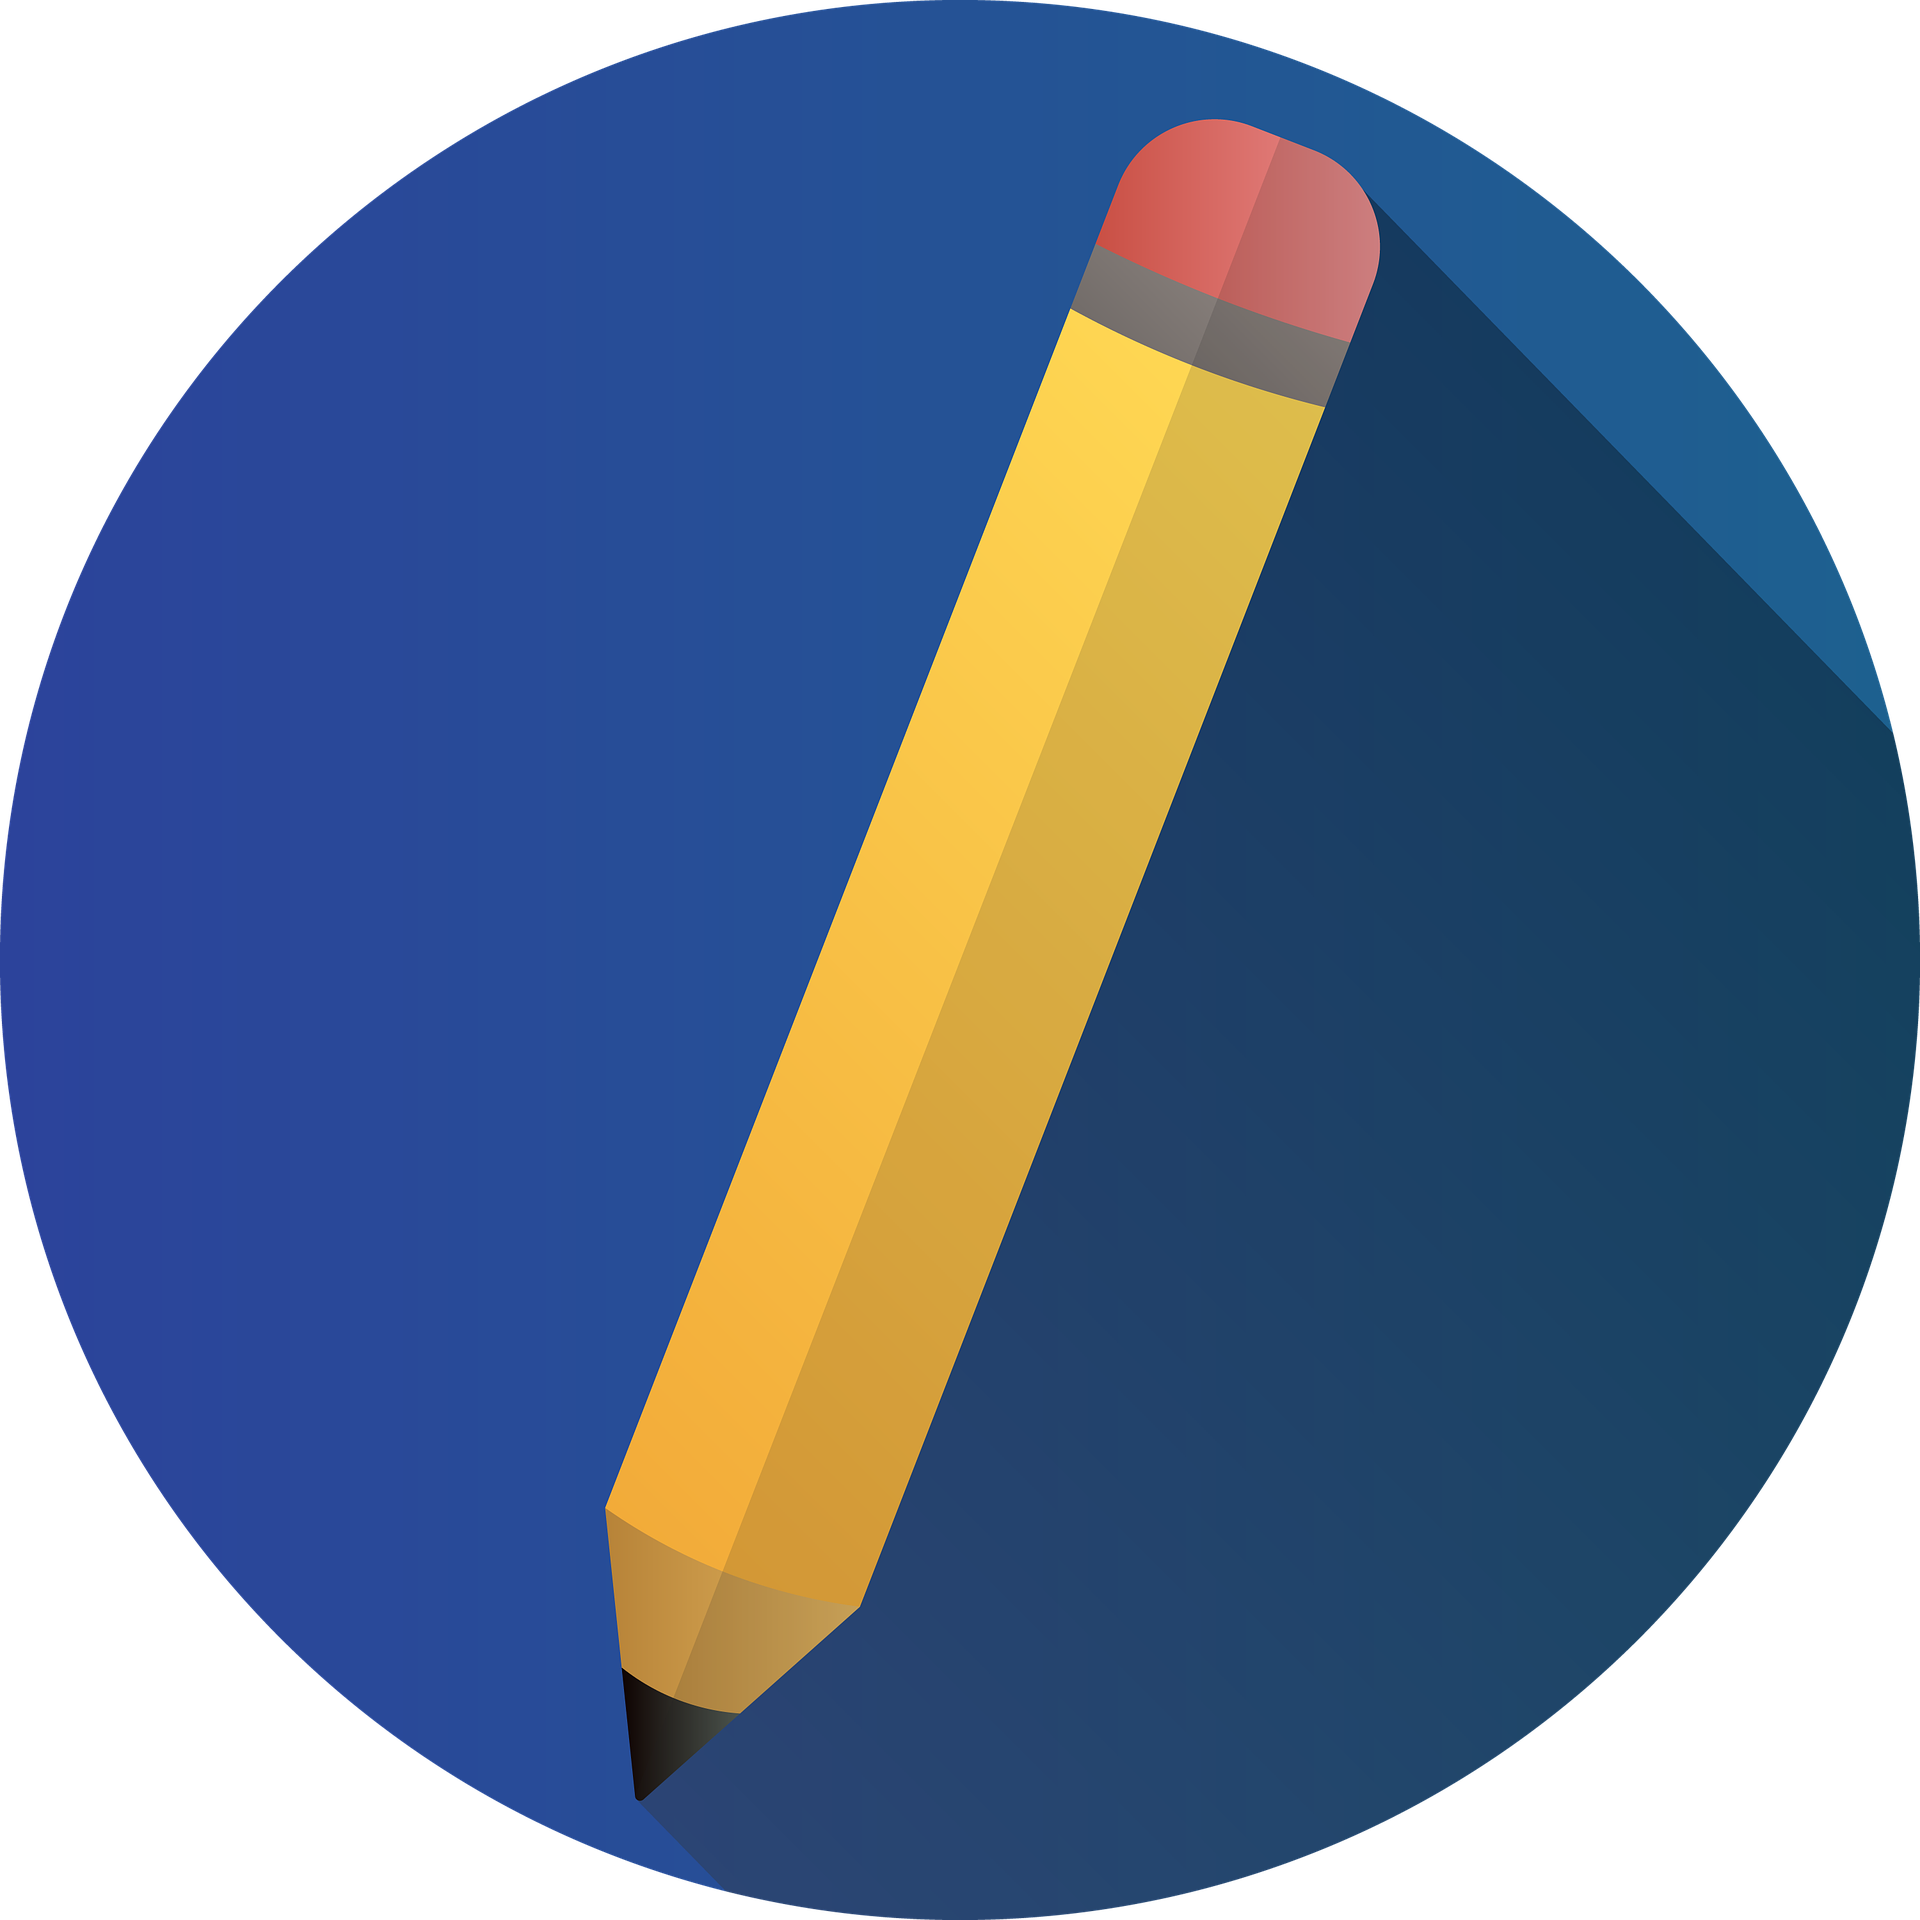 Illustration of pencil on blue background